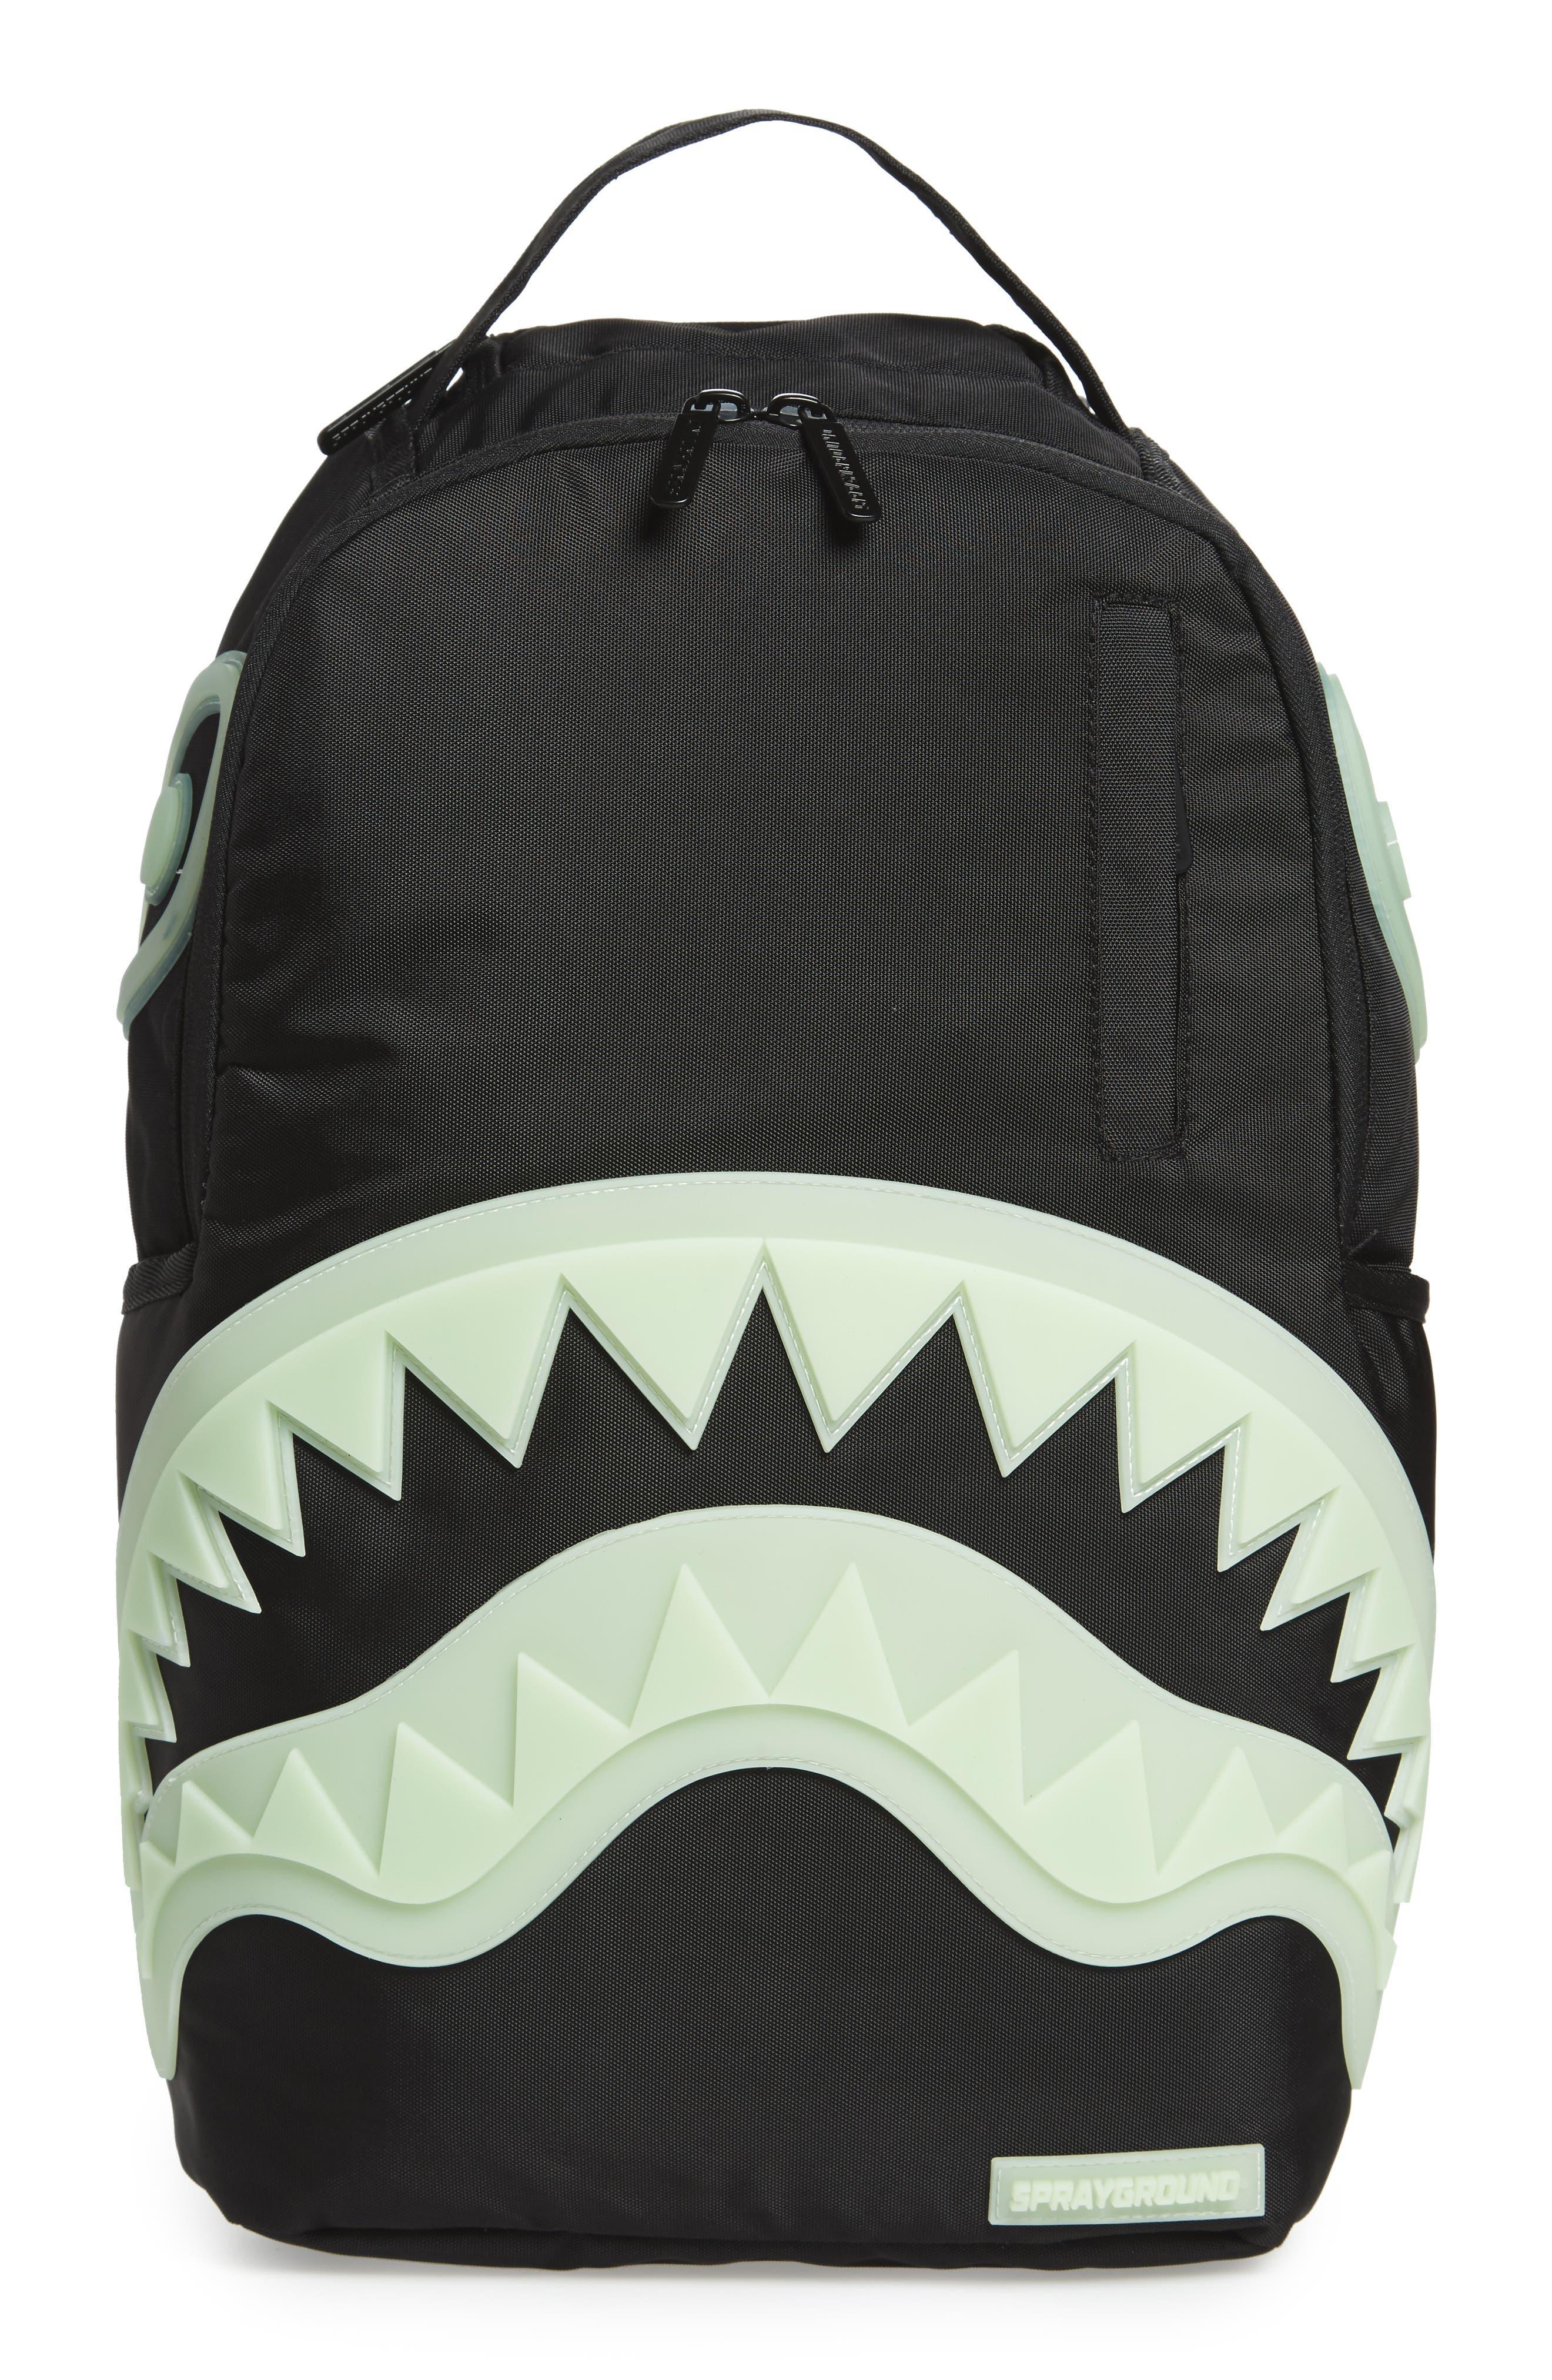 Glow in the Dark Shark Backpack,                             Main thumbnail 1, color,                             001